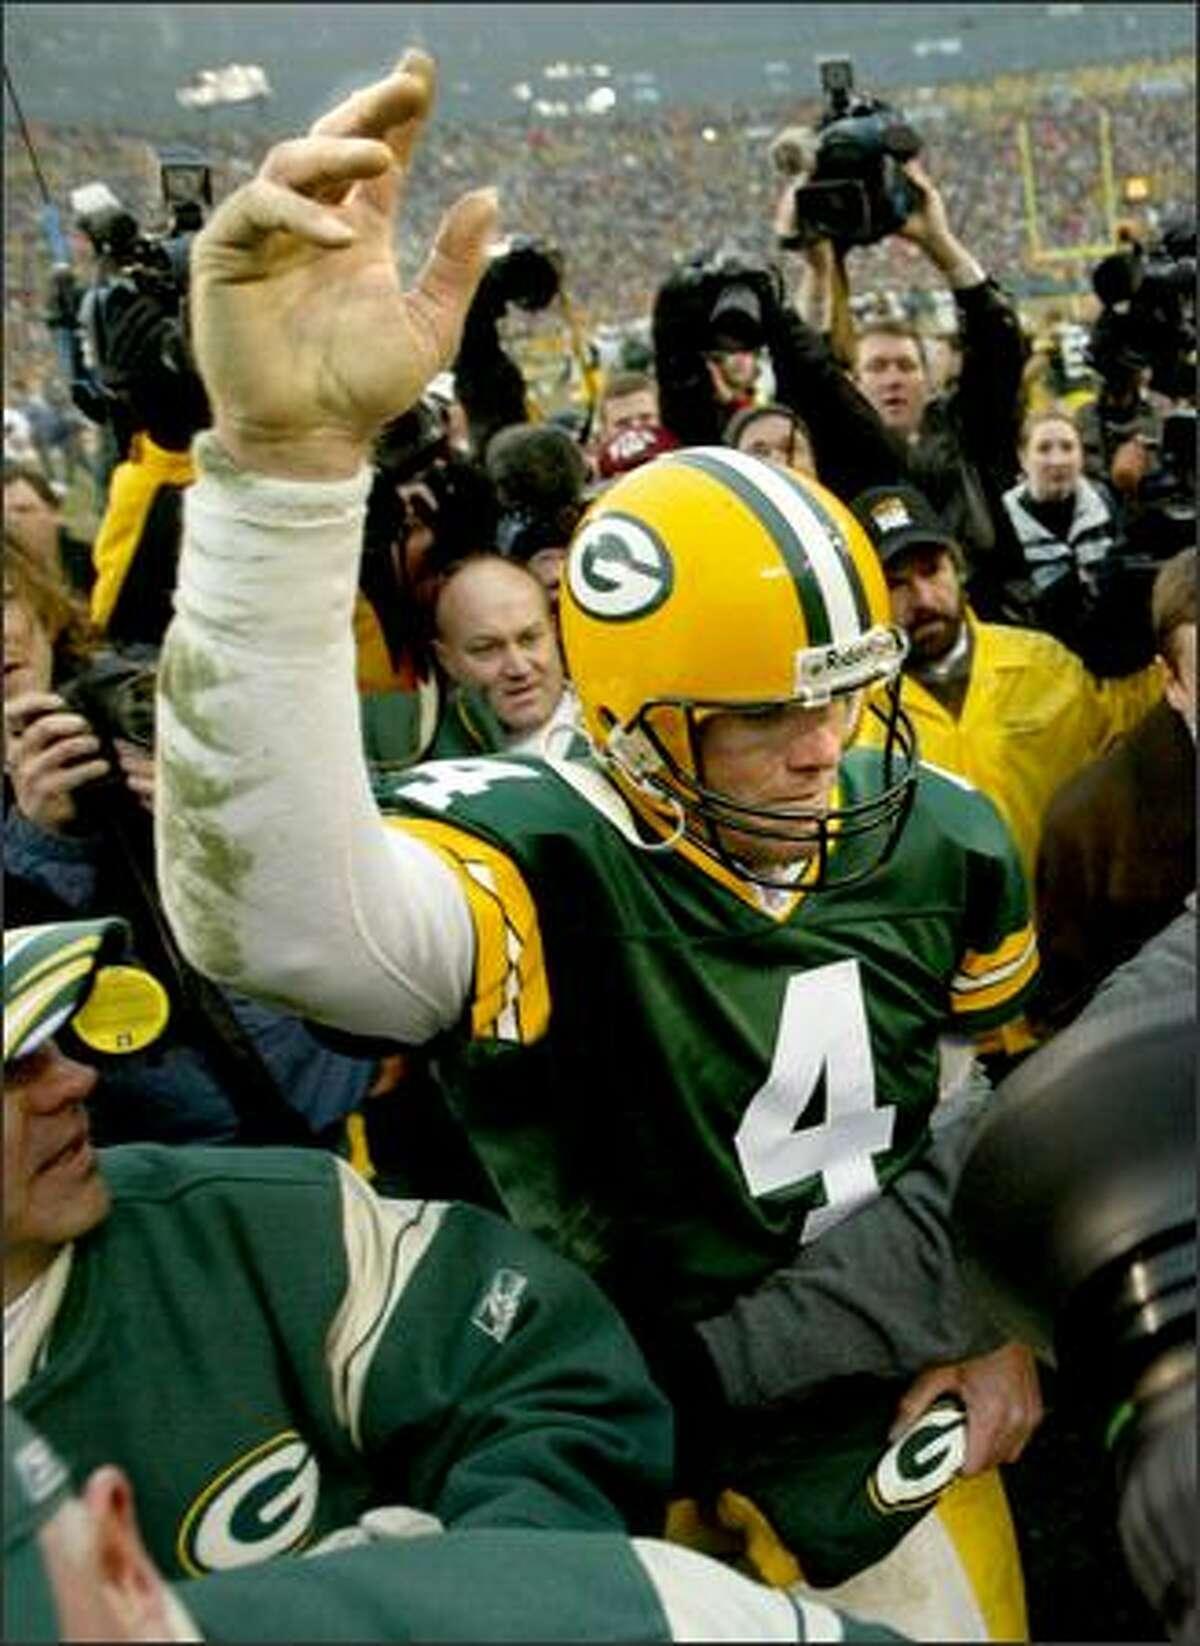 Packers quarterback Brett Favre waves to the fans as he walks off the field.